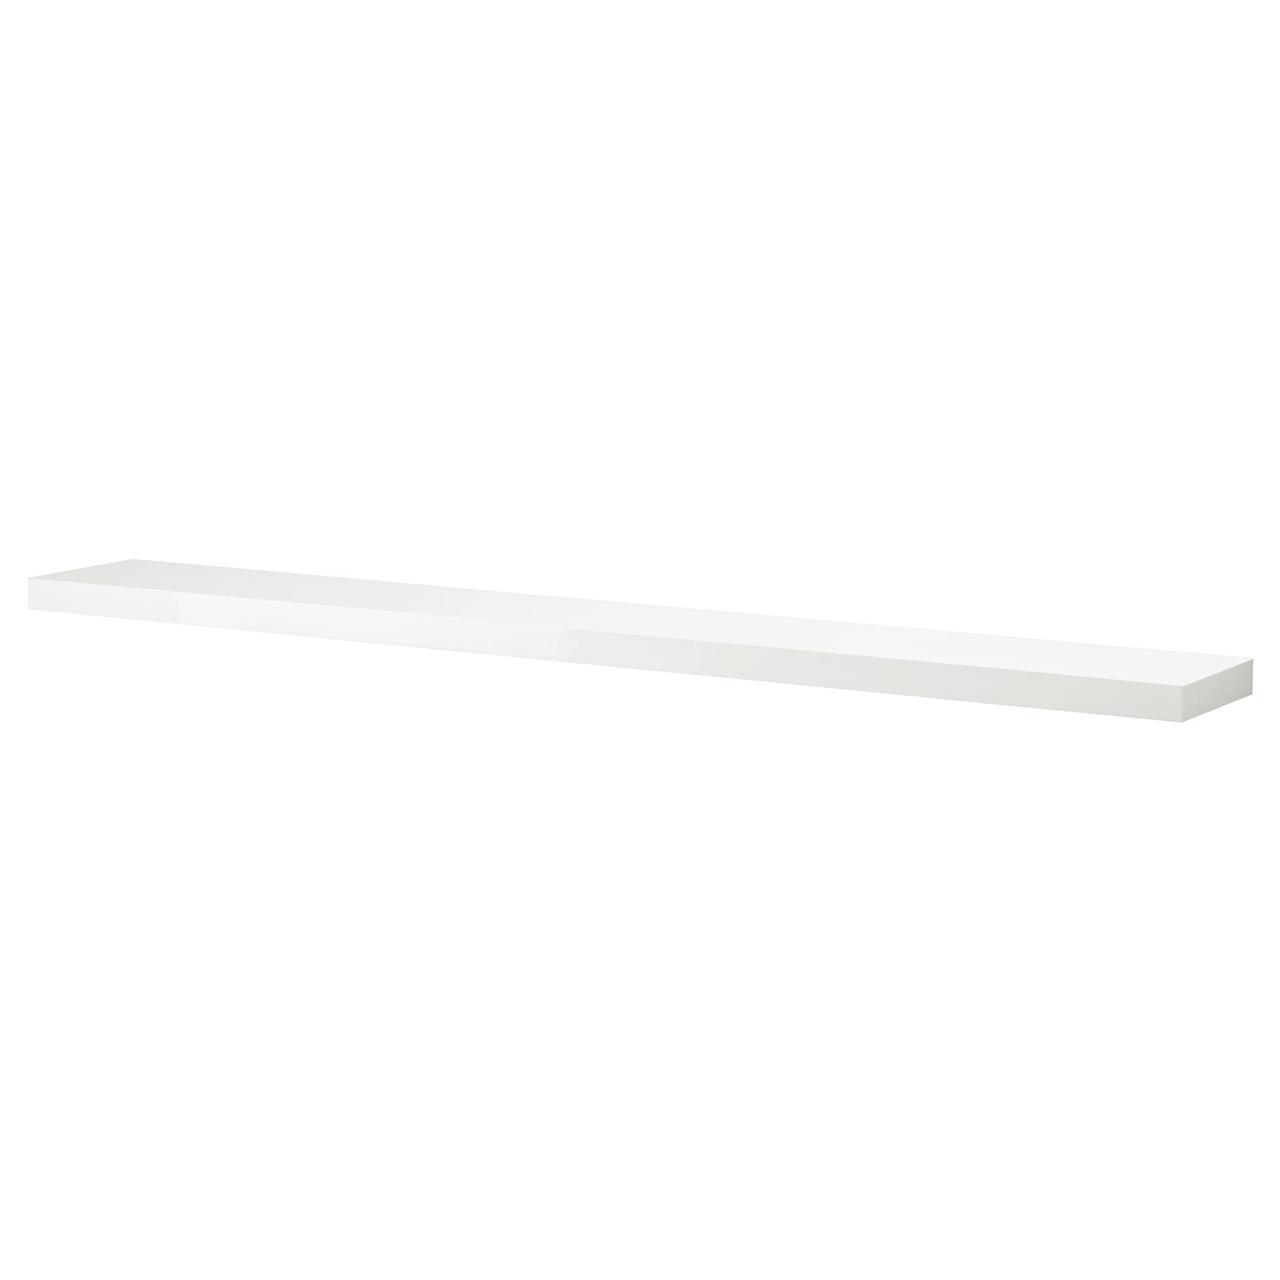 IKEA LACK (403.096.53) Настенная полка, белая